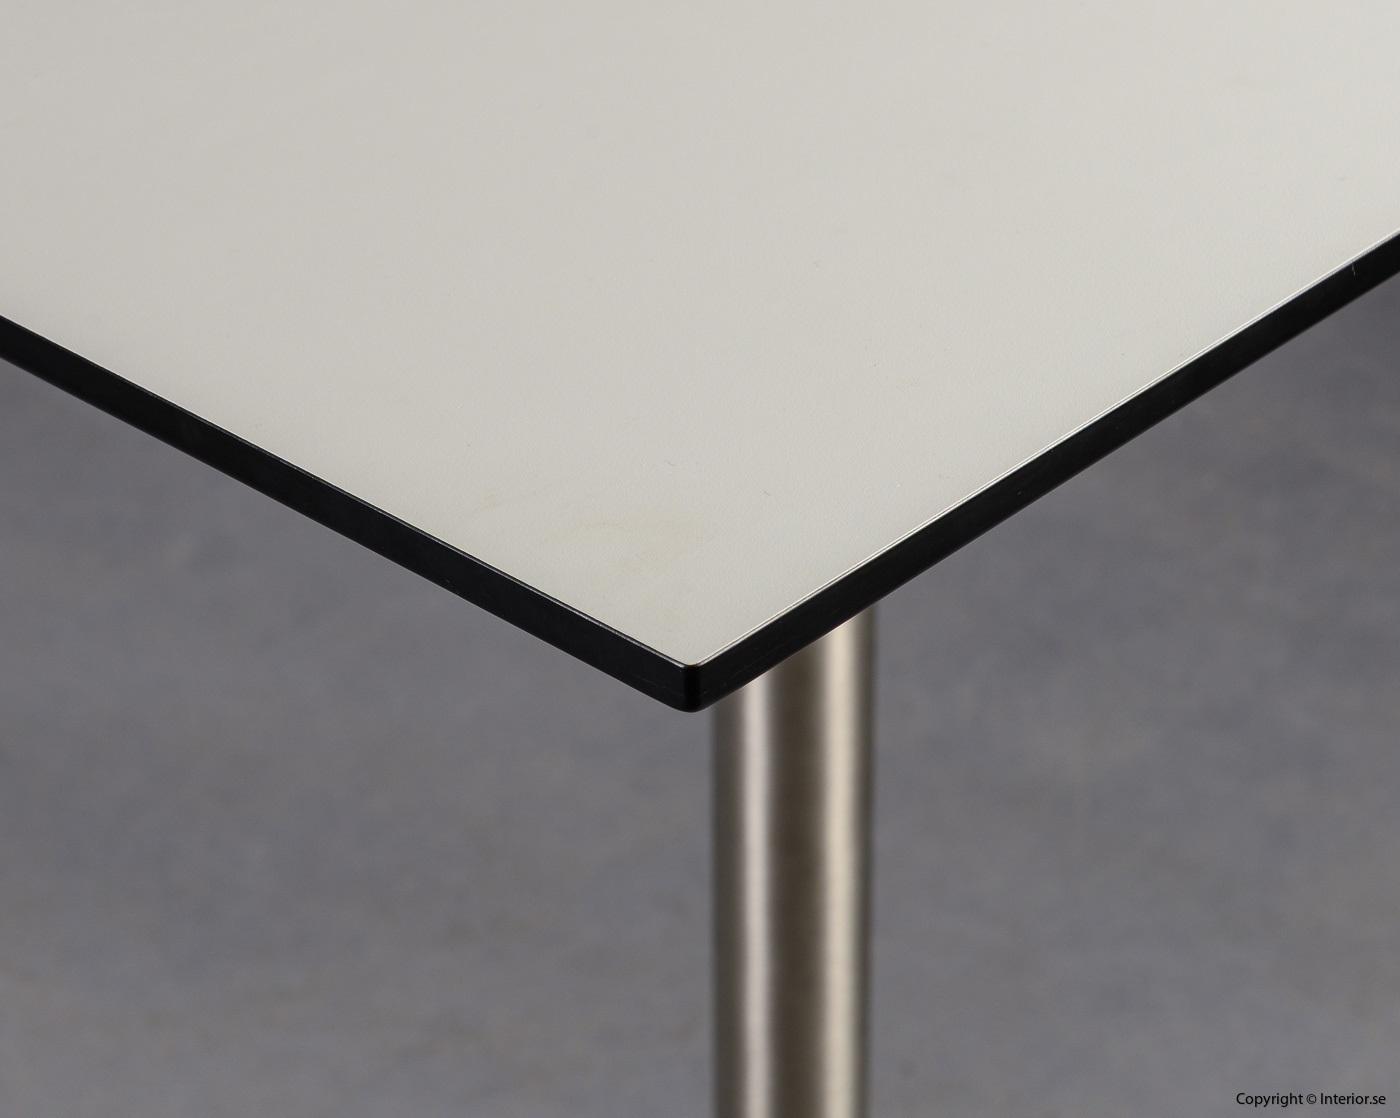 1 Bord Pausitan Spinal Table Paul Leroy begagnade kontorsmöbler designmöbler (3)